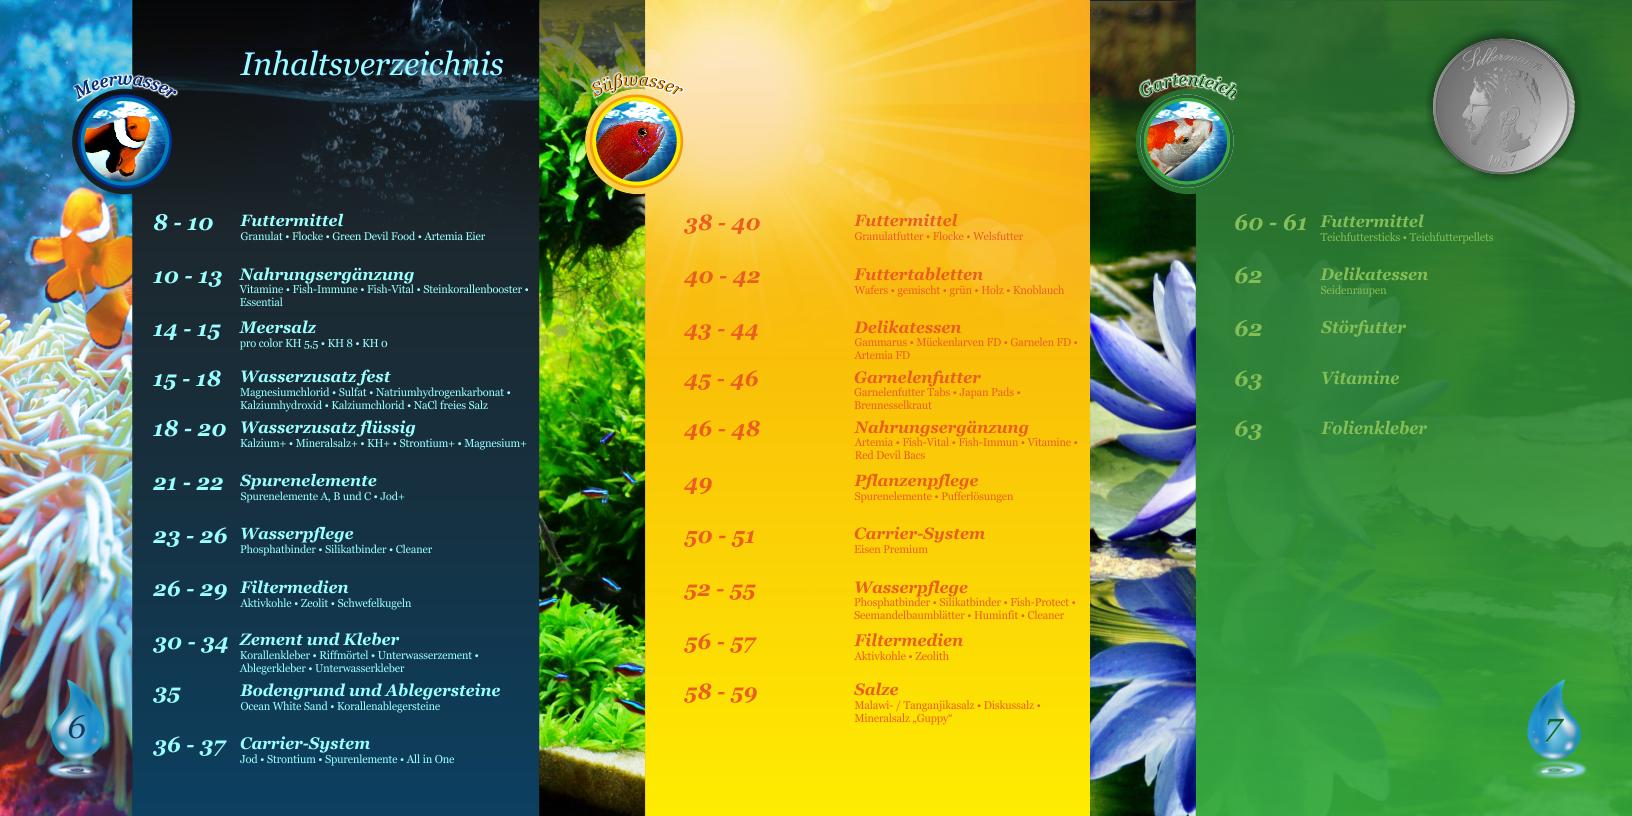 Aquaristik Silbermann Katalog - Inhaltsverzeichnis